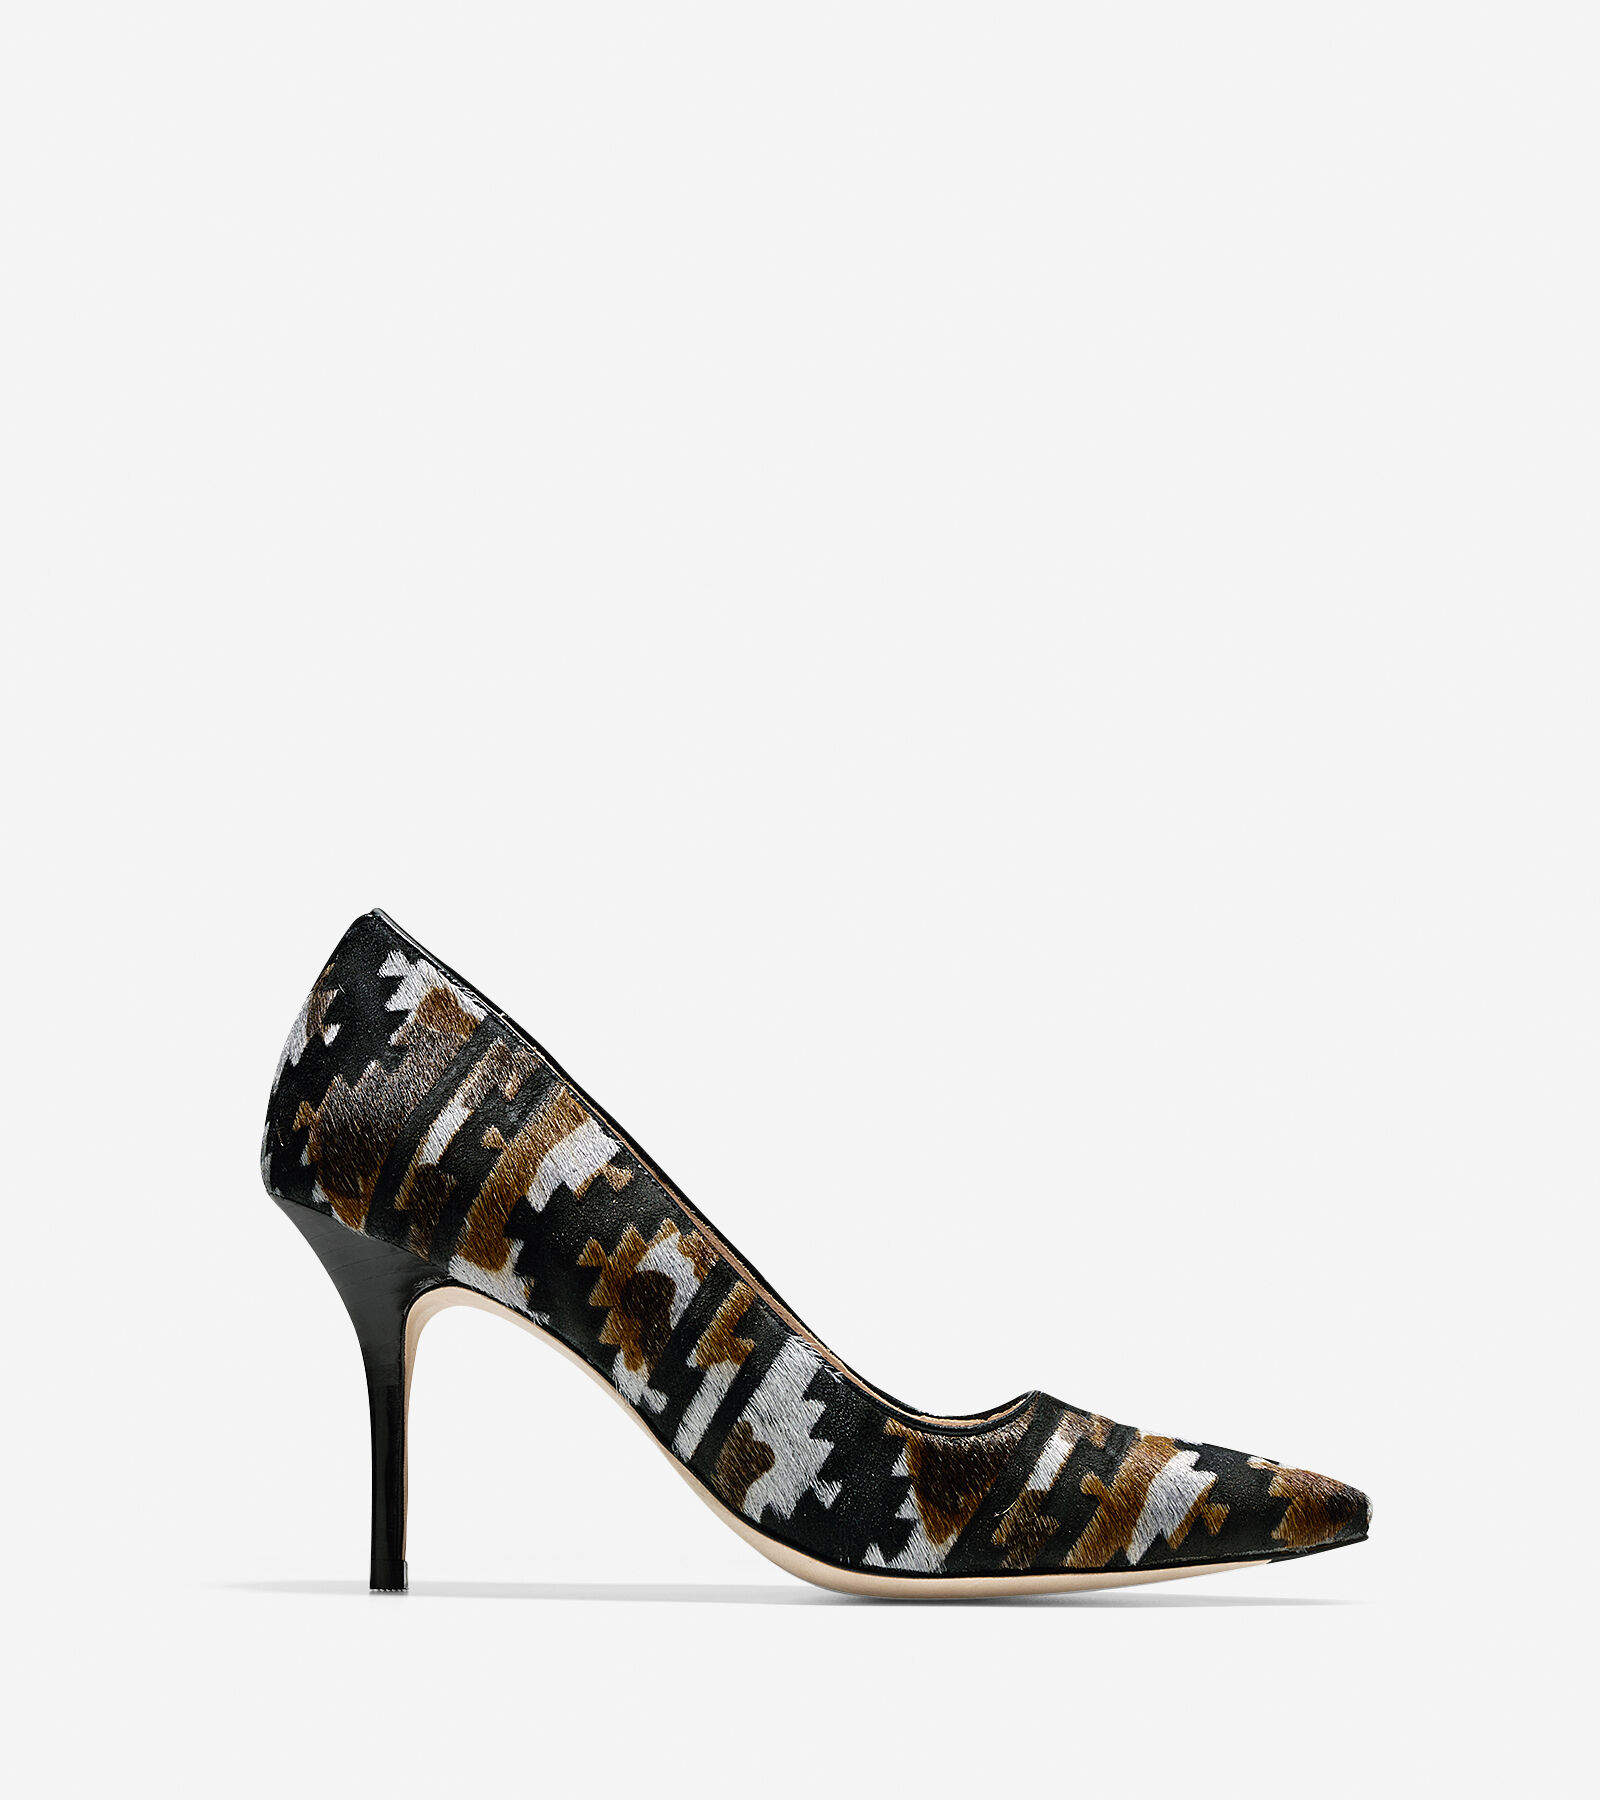 Womens Shoes Cole Haan Bradshaw Pump 85 Charcoal Multi Haircalf